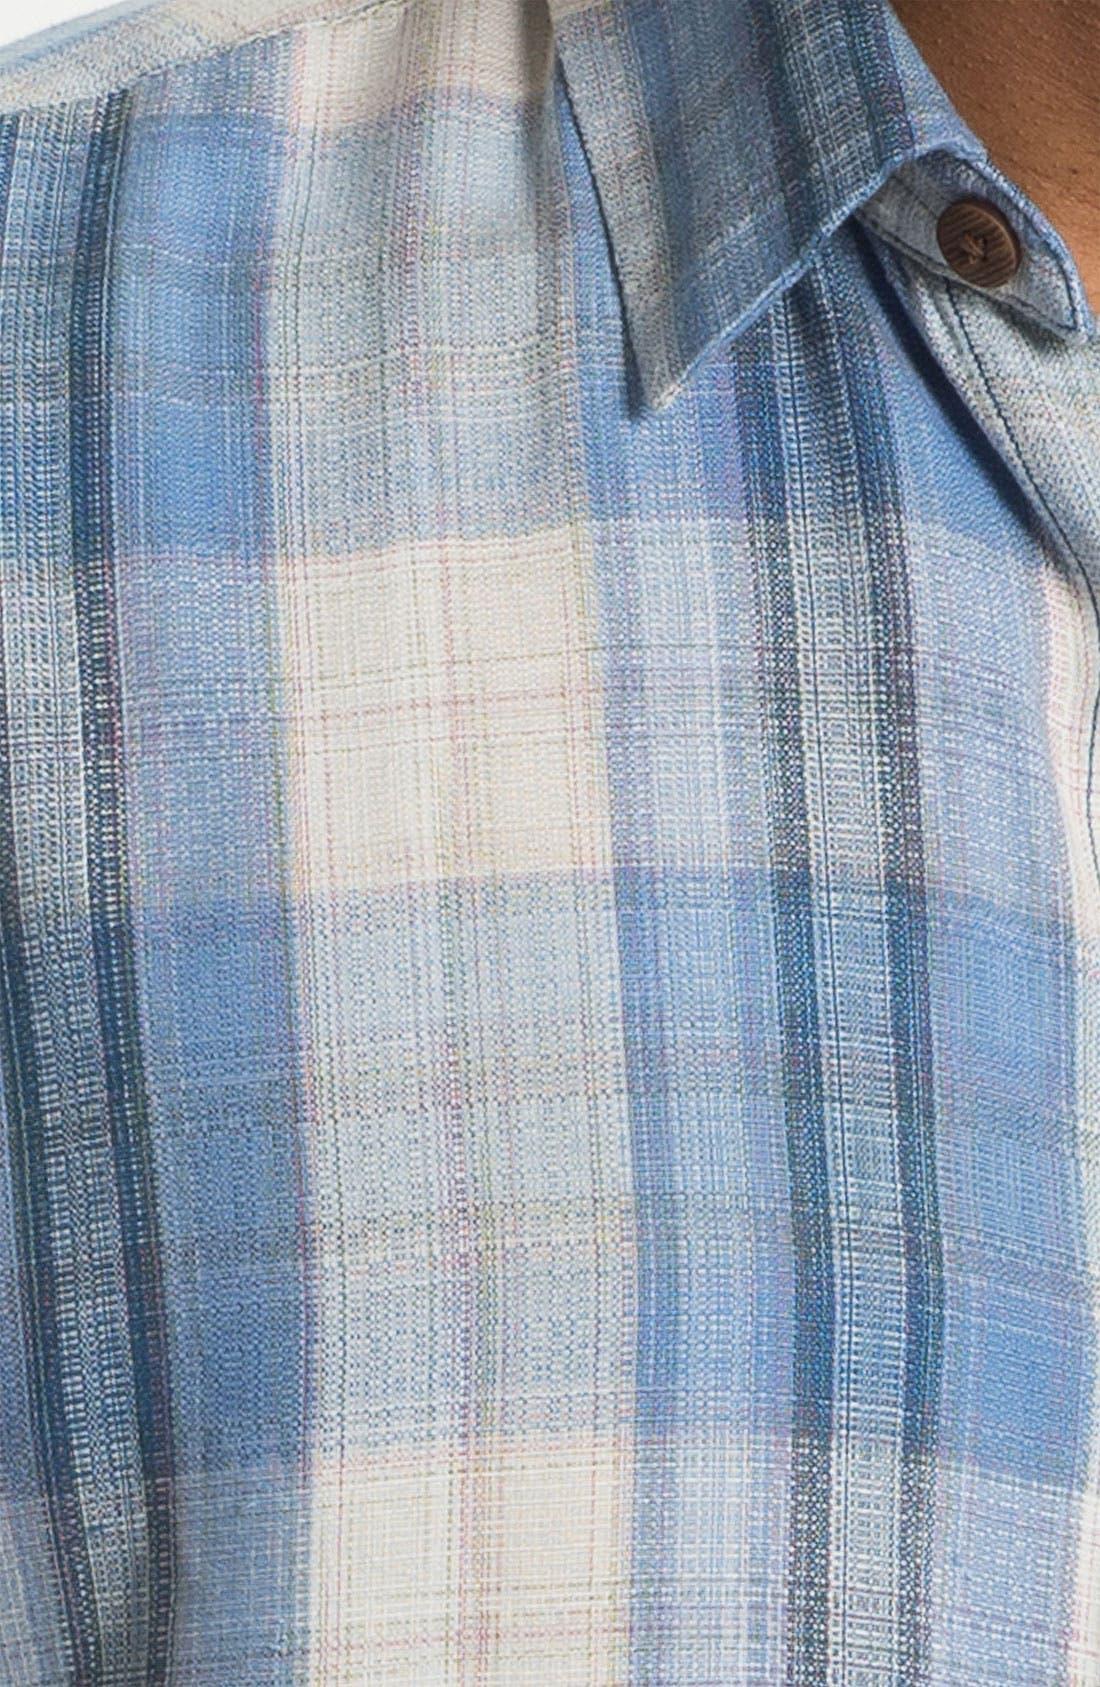 Alternate Image 3  - Tommy Bahama 'Seaside Plaid' Silk Campshirt (Big & Tall)